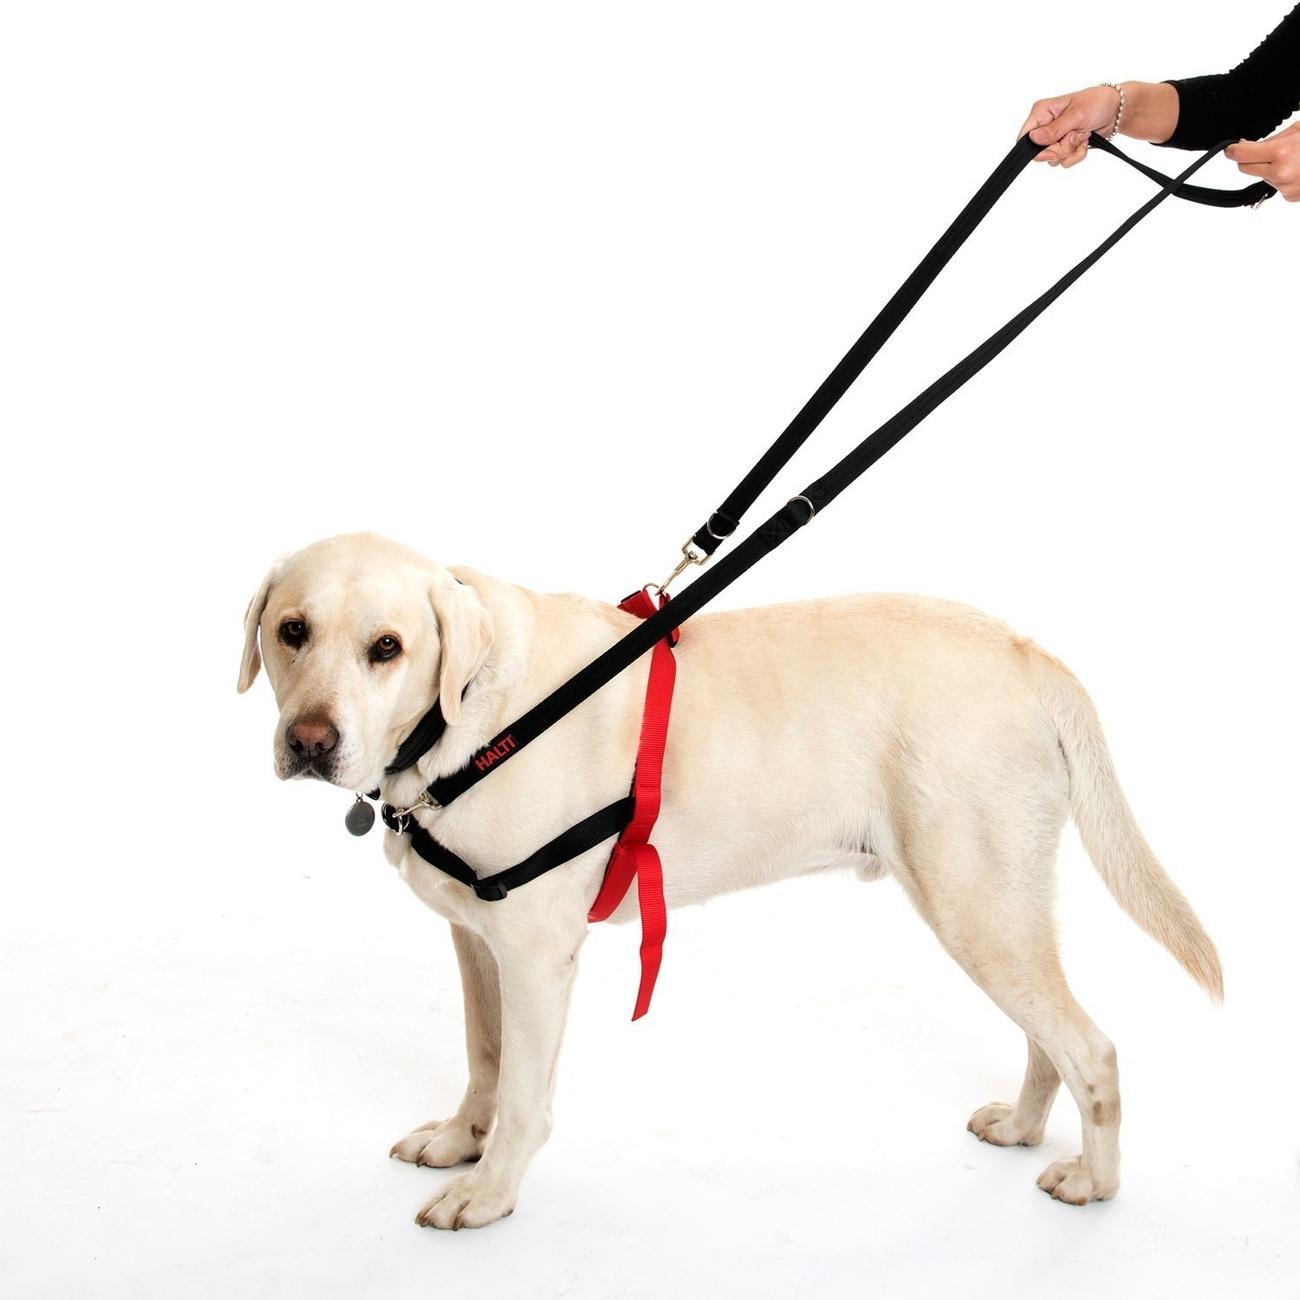 Company of Animals Halti Leine Training Lead, Bild 6